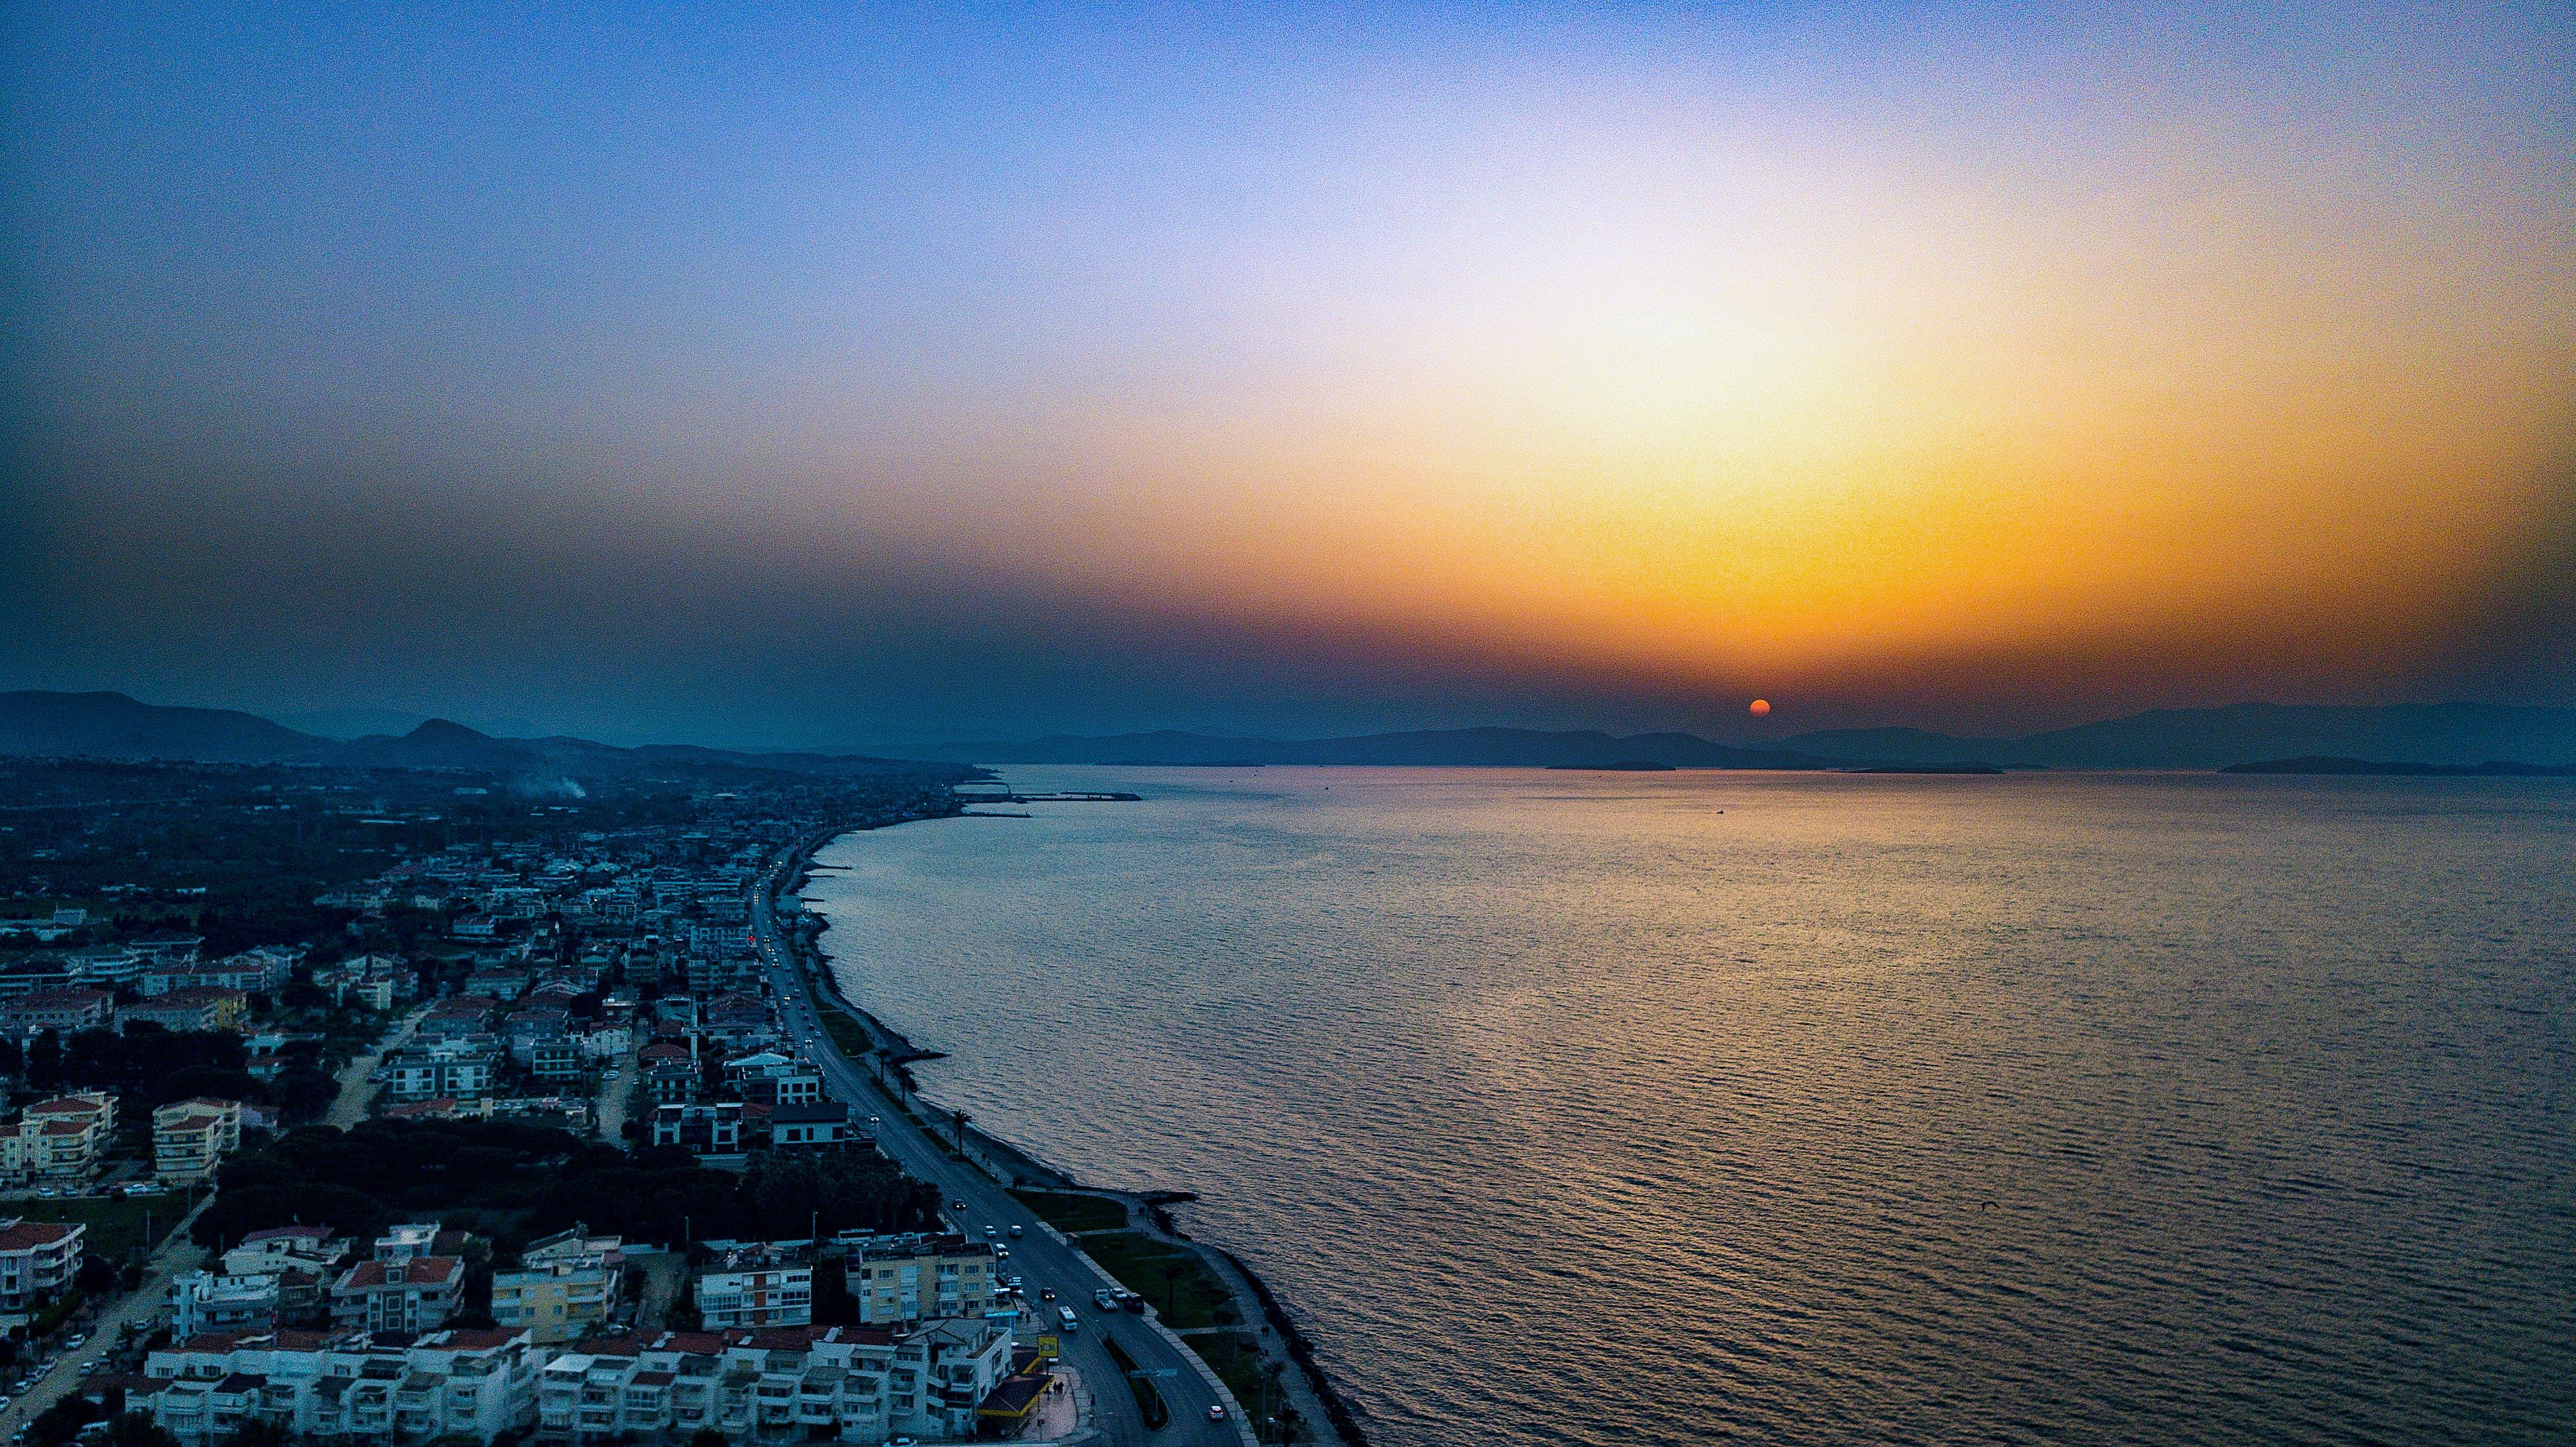 Bird's Eye View of City Near Ocean During Dawn